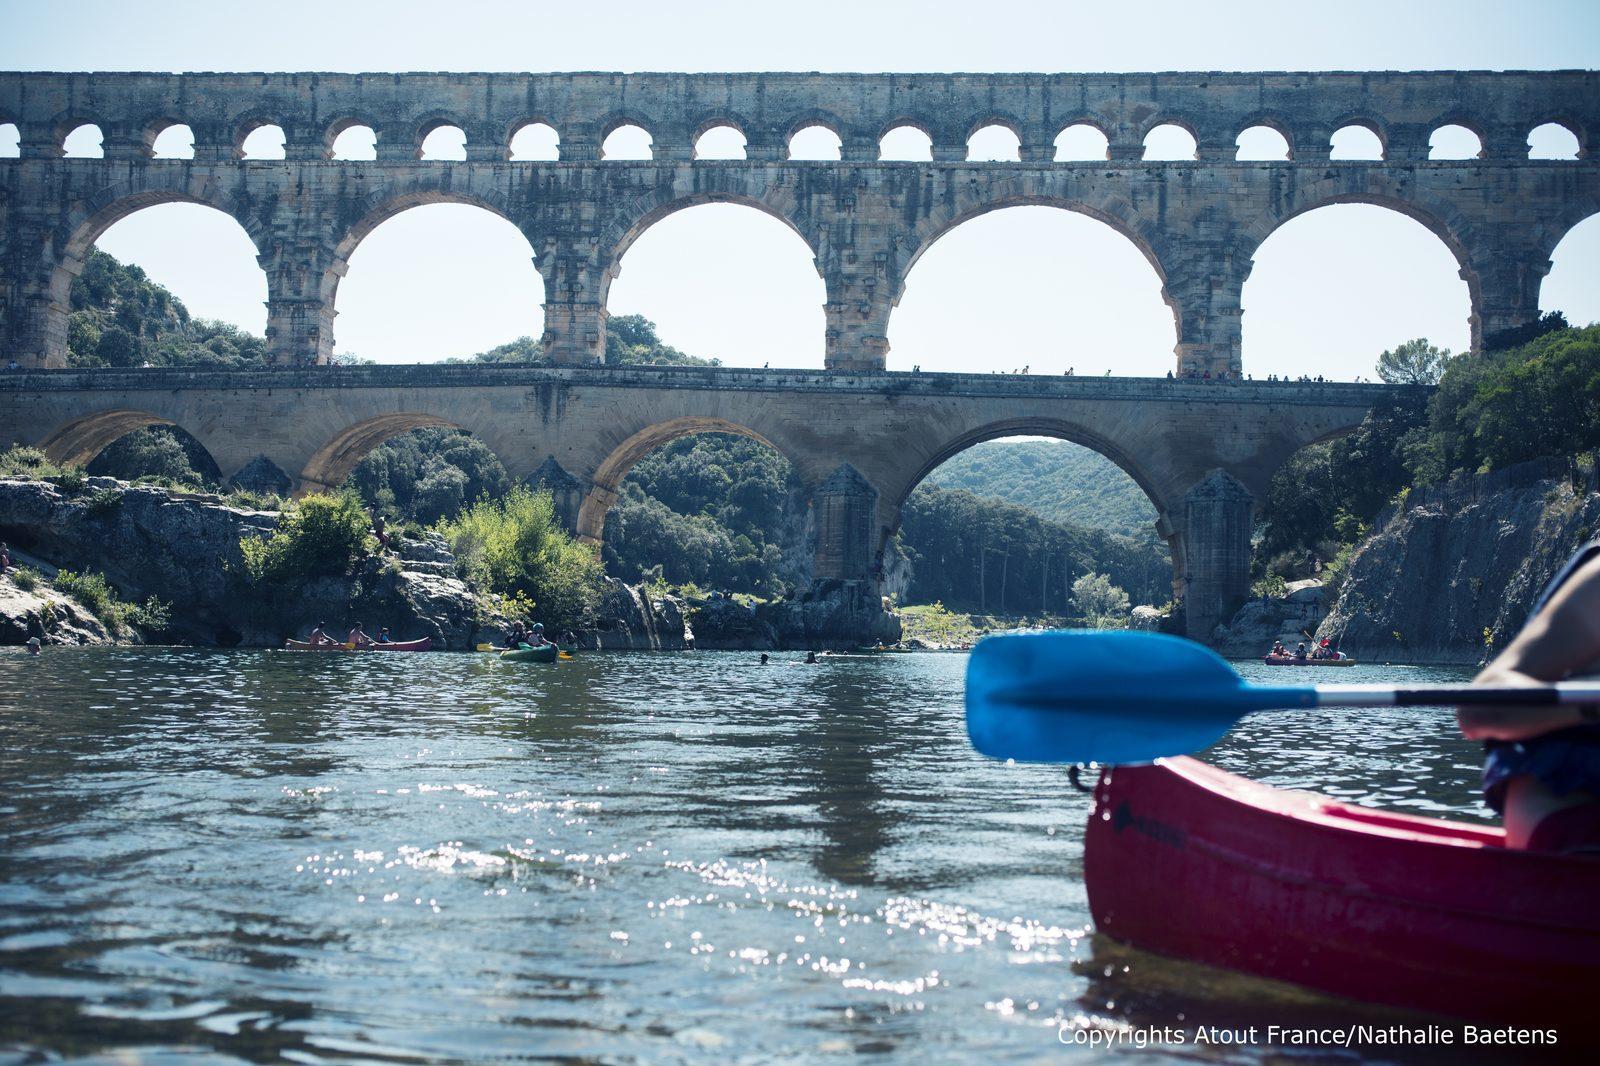 Frankrijk, Gard, Pont du Gard, kanovaren, Languedoc Roussillon, vakantie